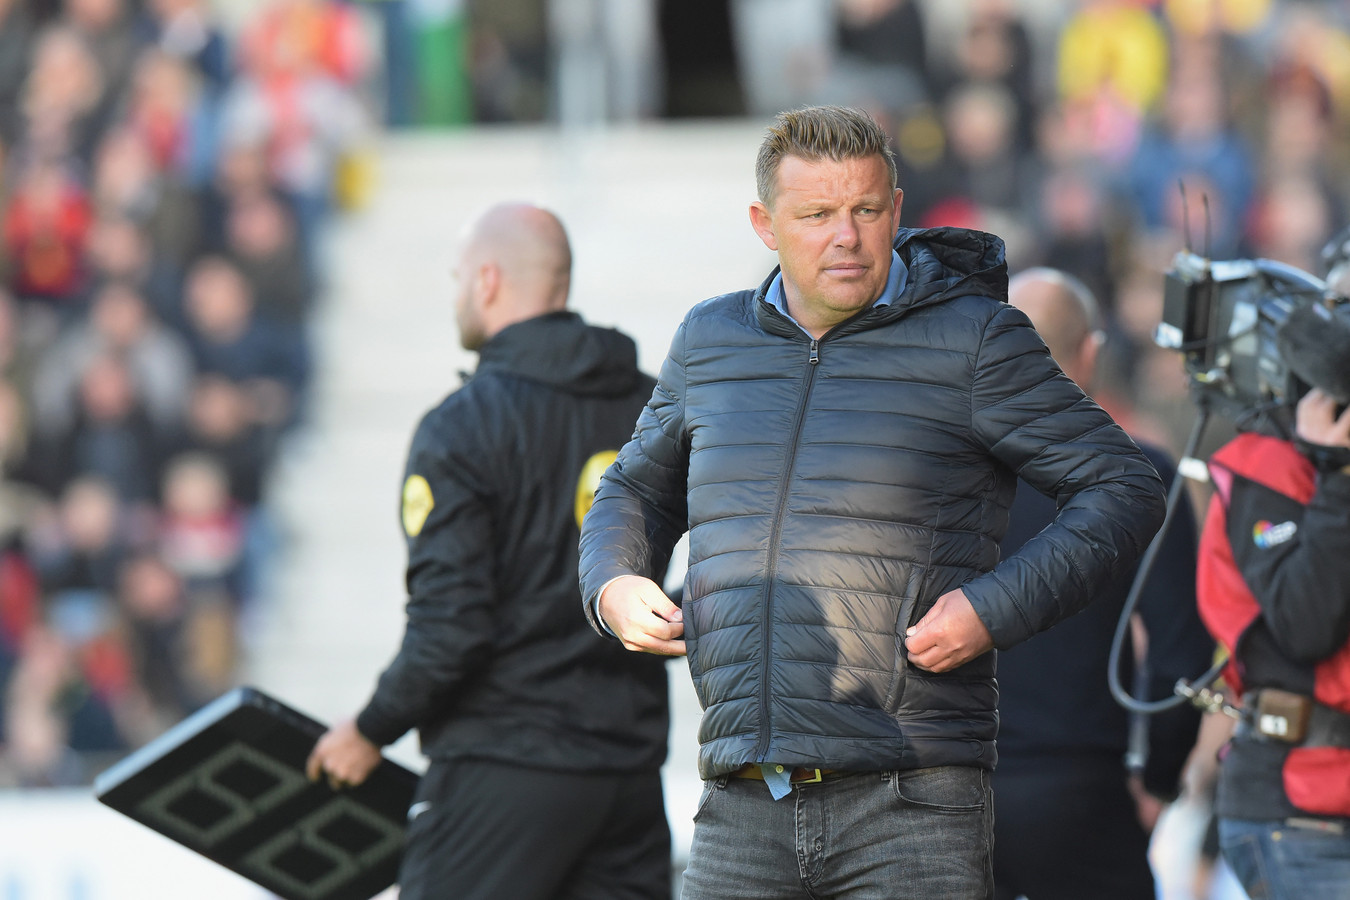 28-05-2019: Voetbal: Go Ahead Eagles v RKC Waalwijk: DeventerKeukenkampioendivisie seizoen 2018-2019, NacompetitieL-R: John Stegeman, coach-trainer of Go Ahead Eagles